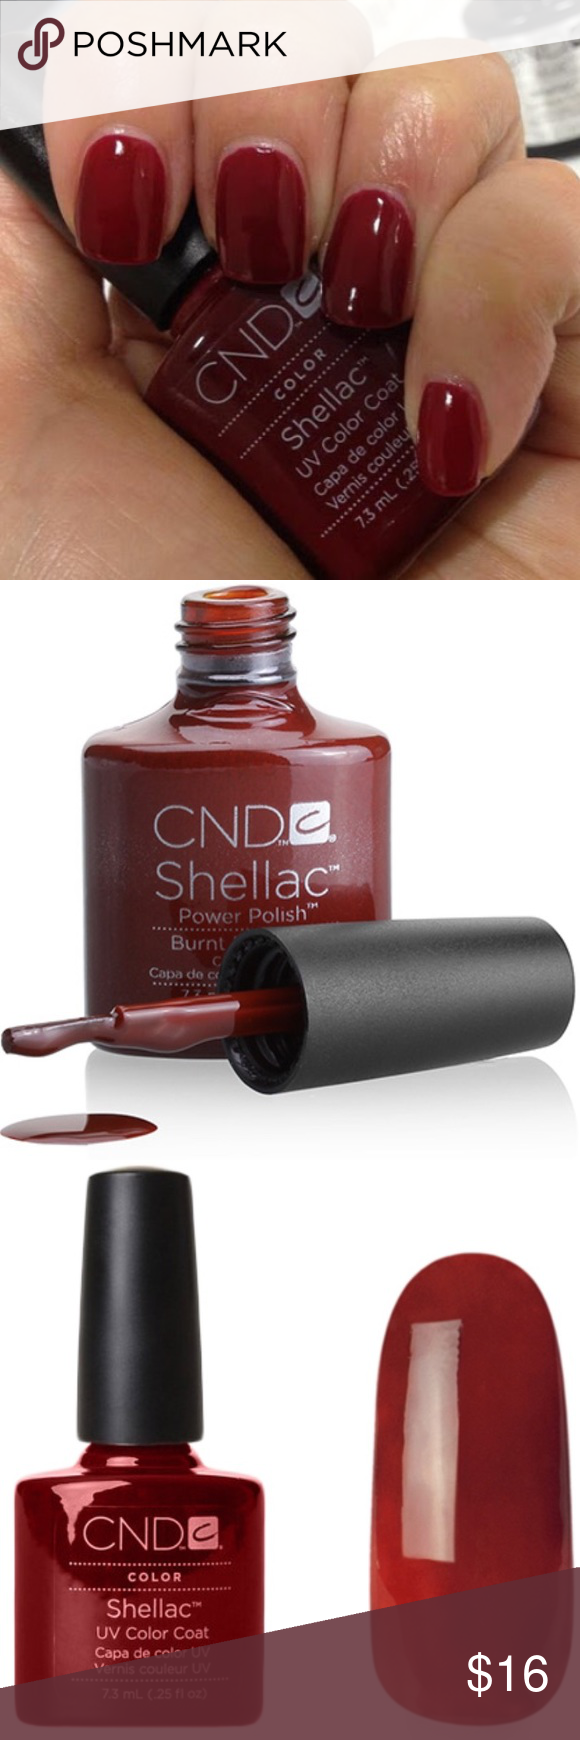 New Cnd Shellac Gel Polish Burnt Romance Full Size Creative Nail